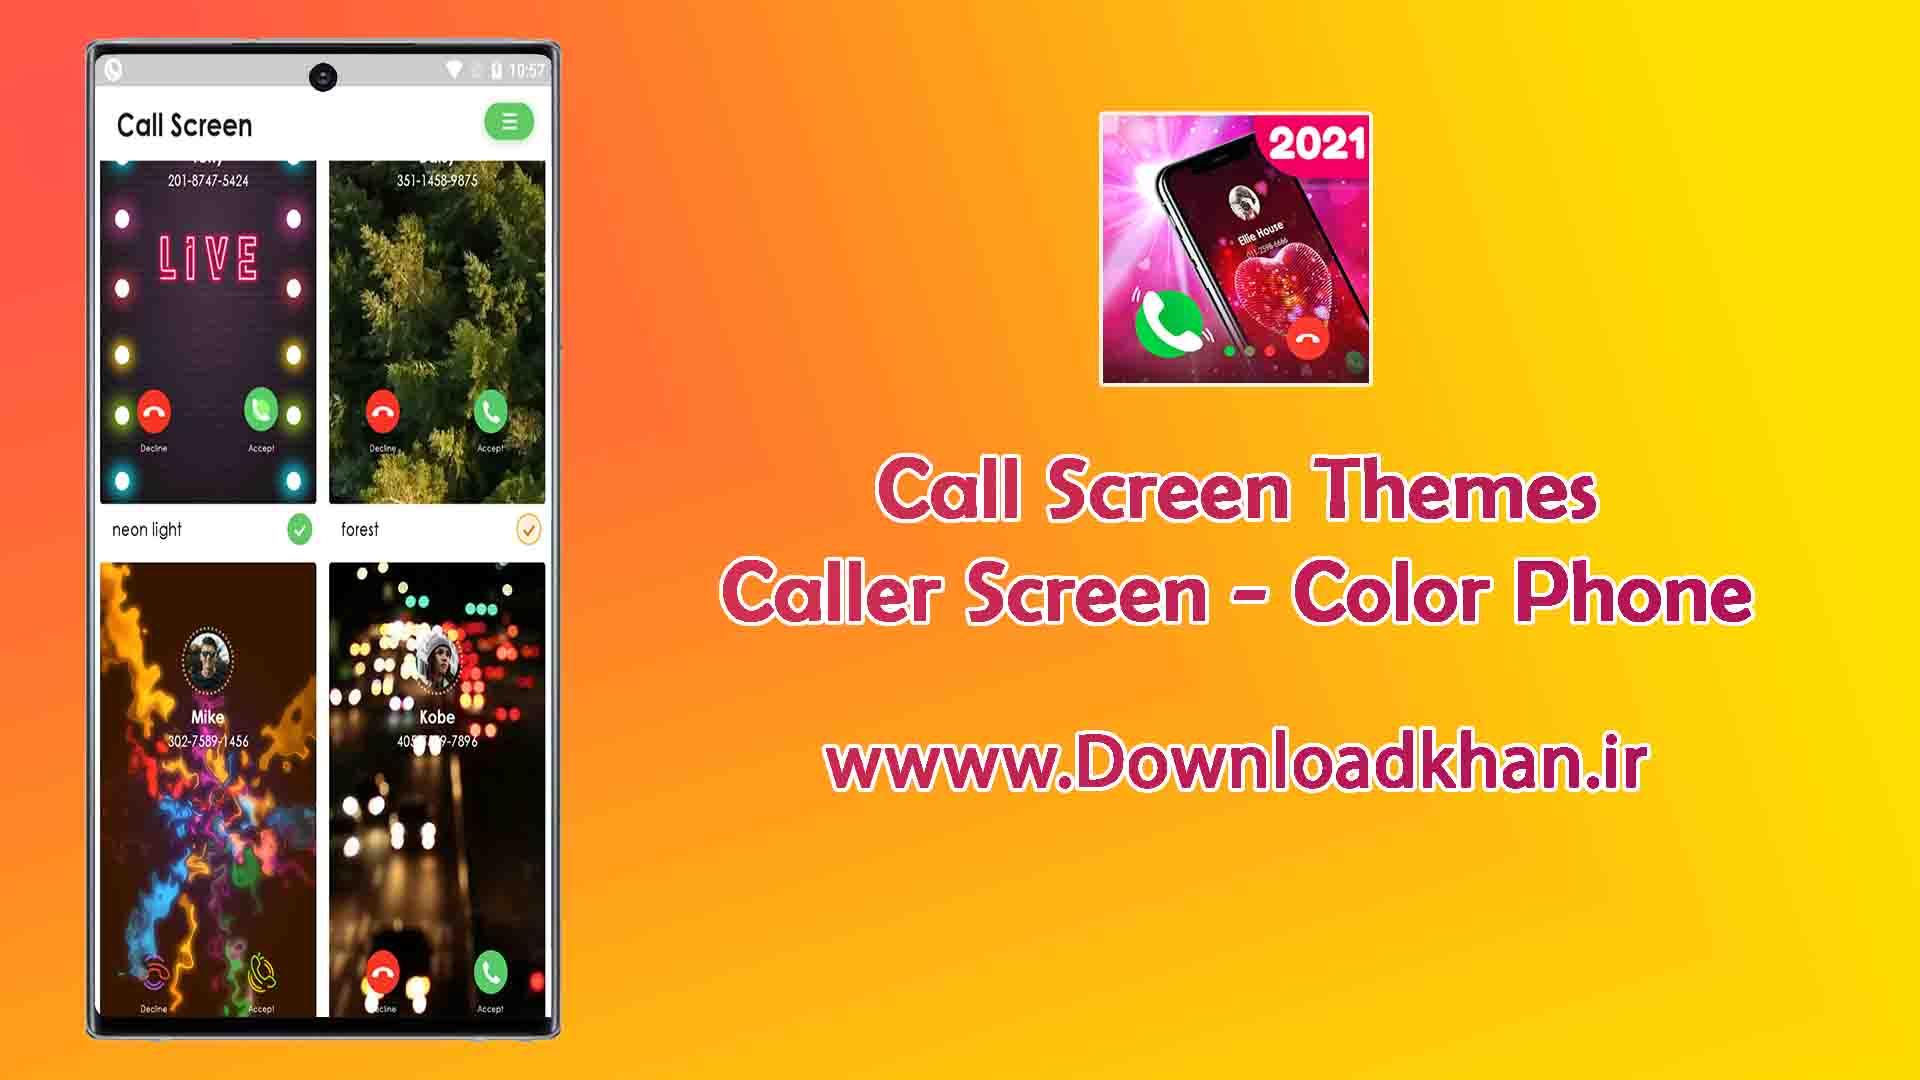 Call Screen Themes